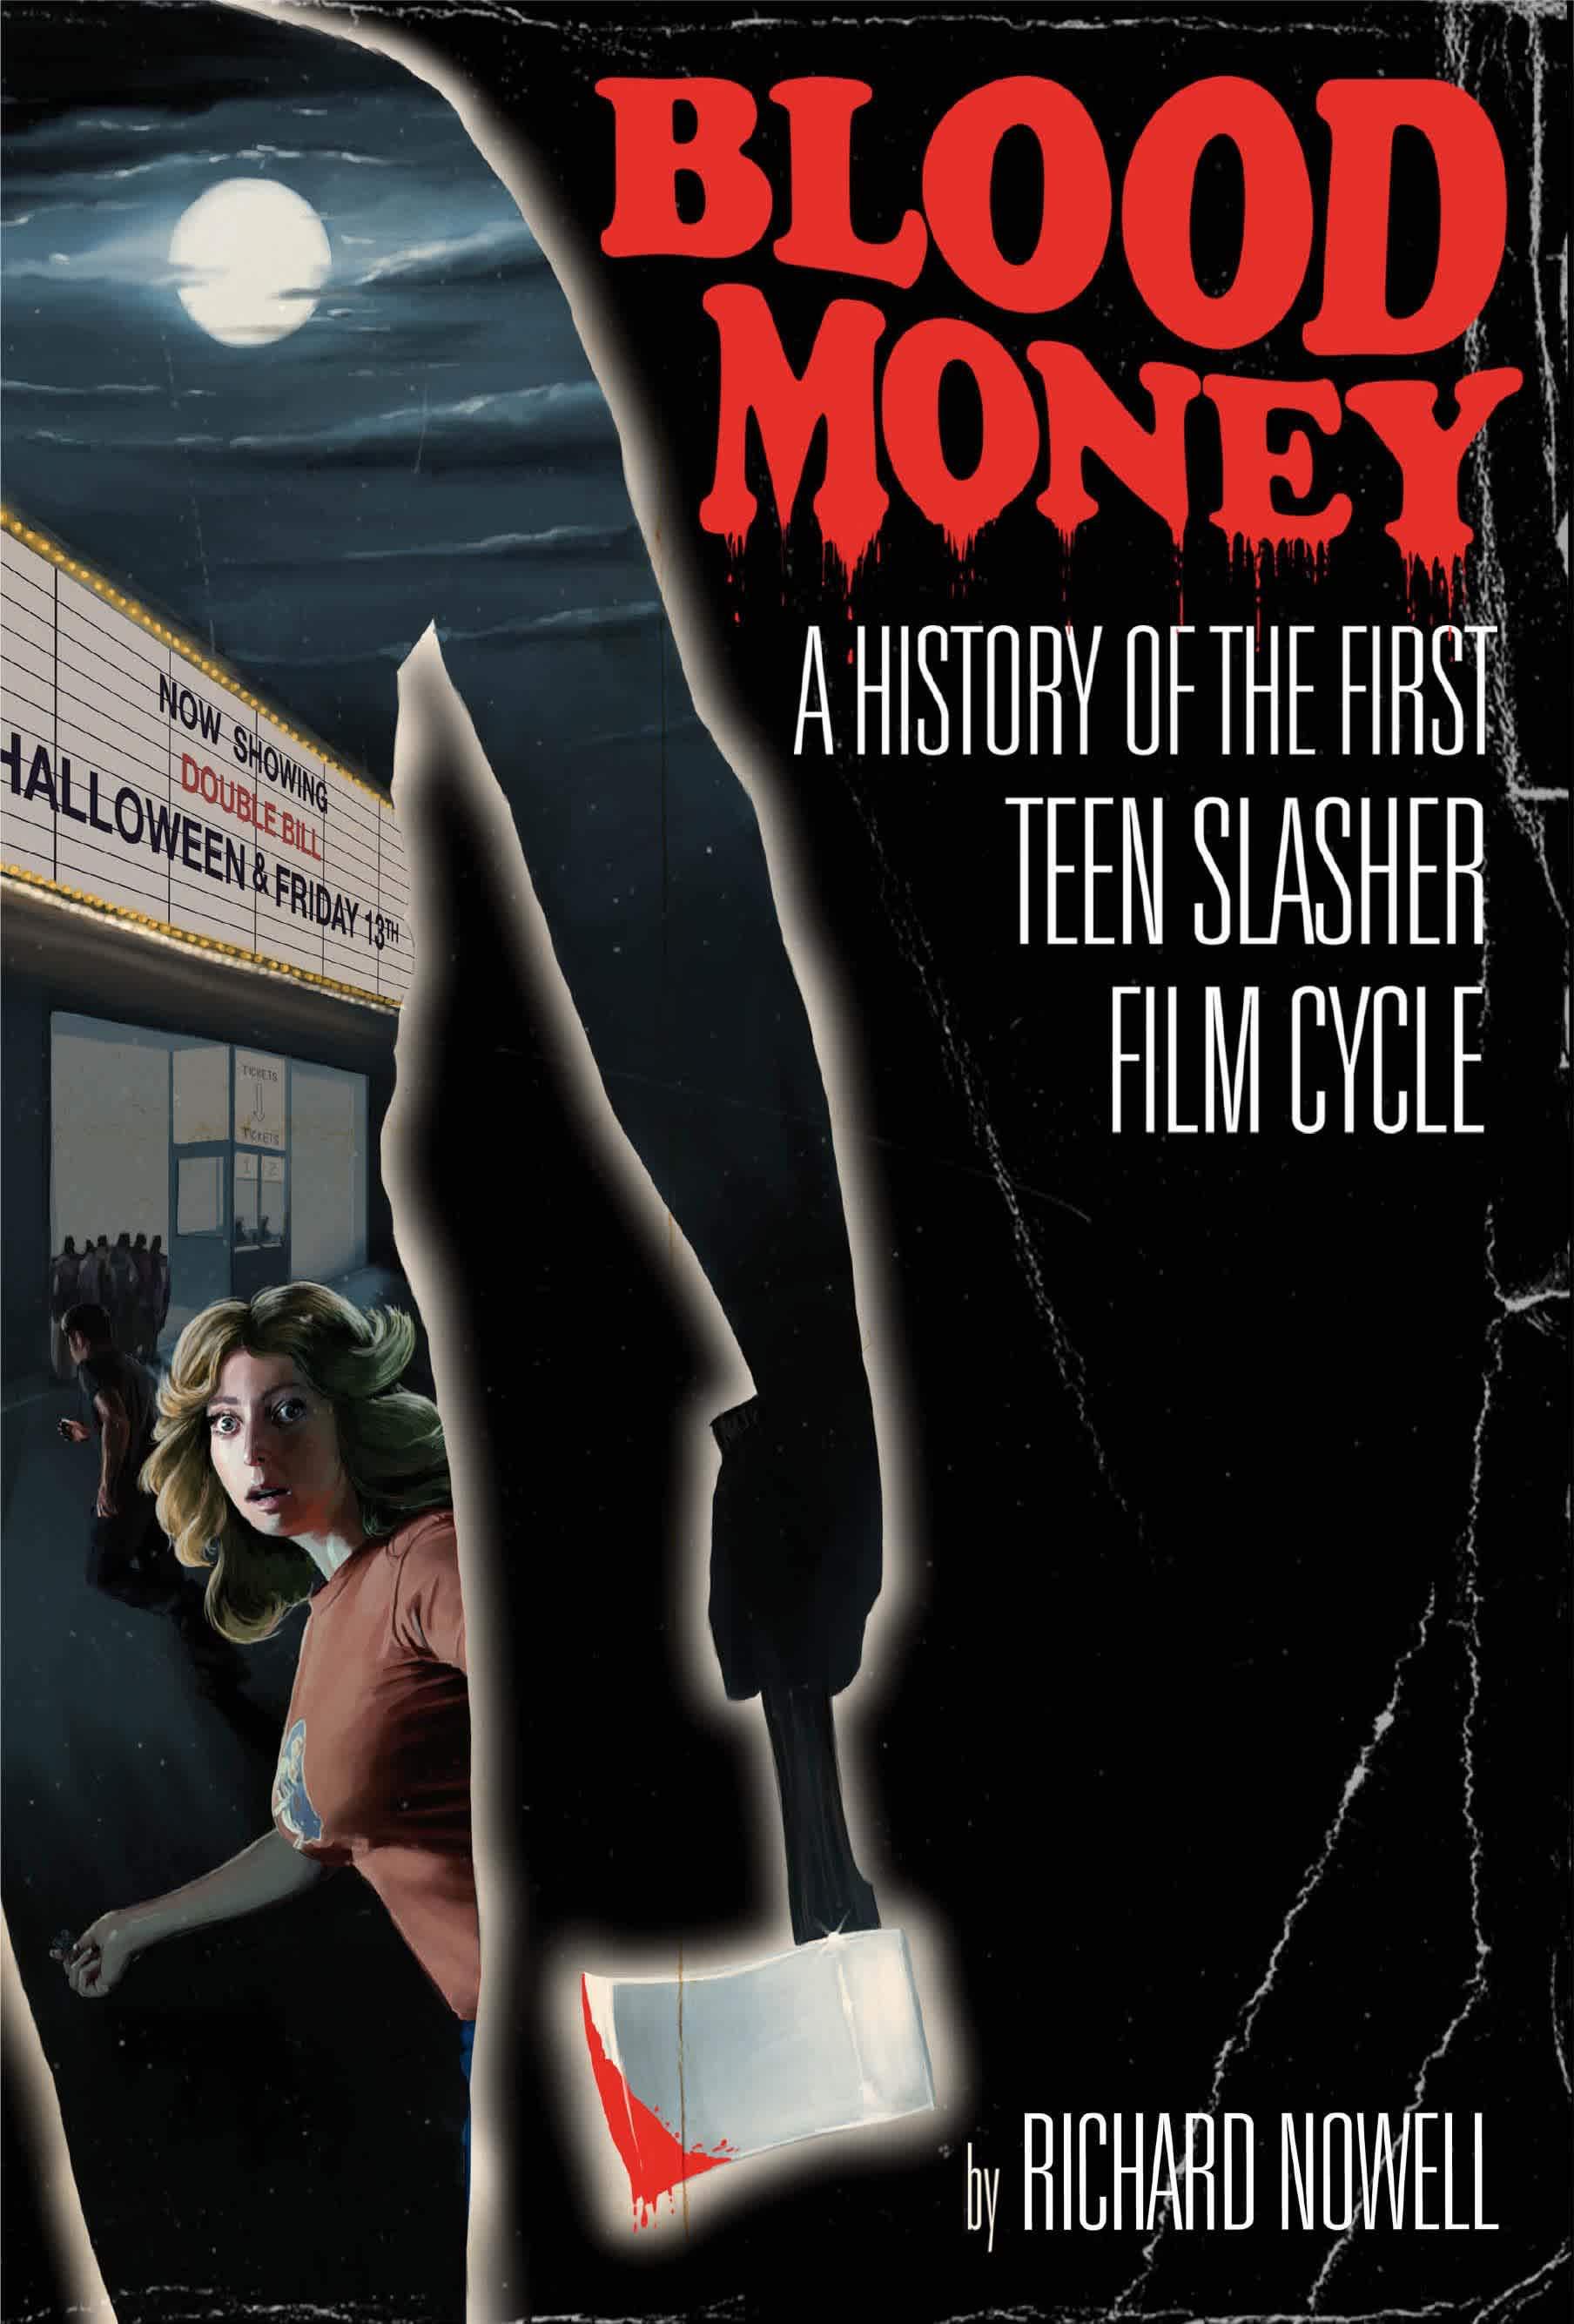 Blood censorship critic film flesh national sex society violence